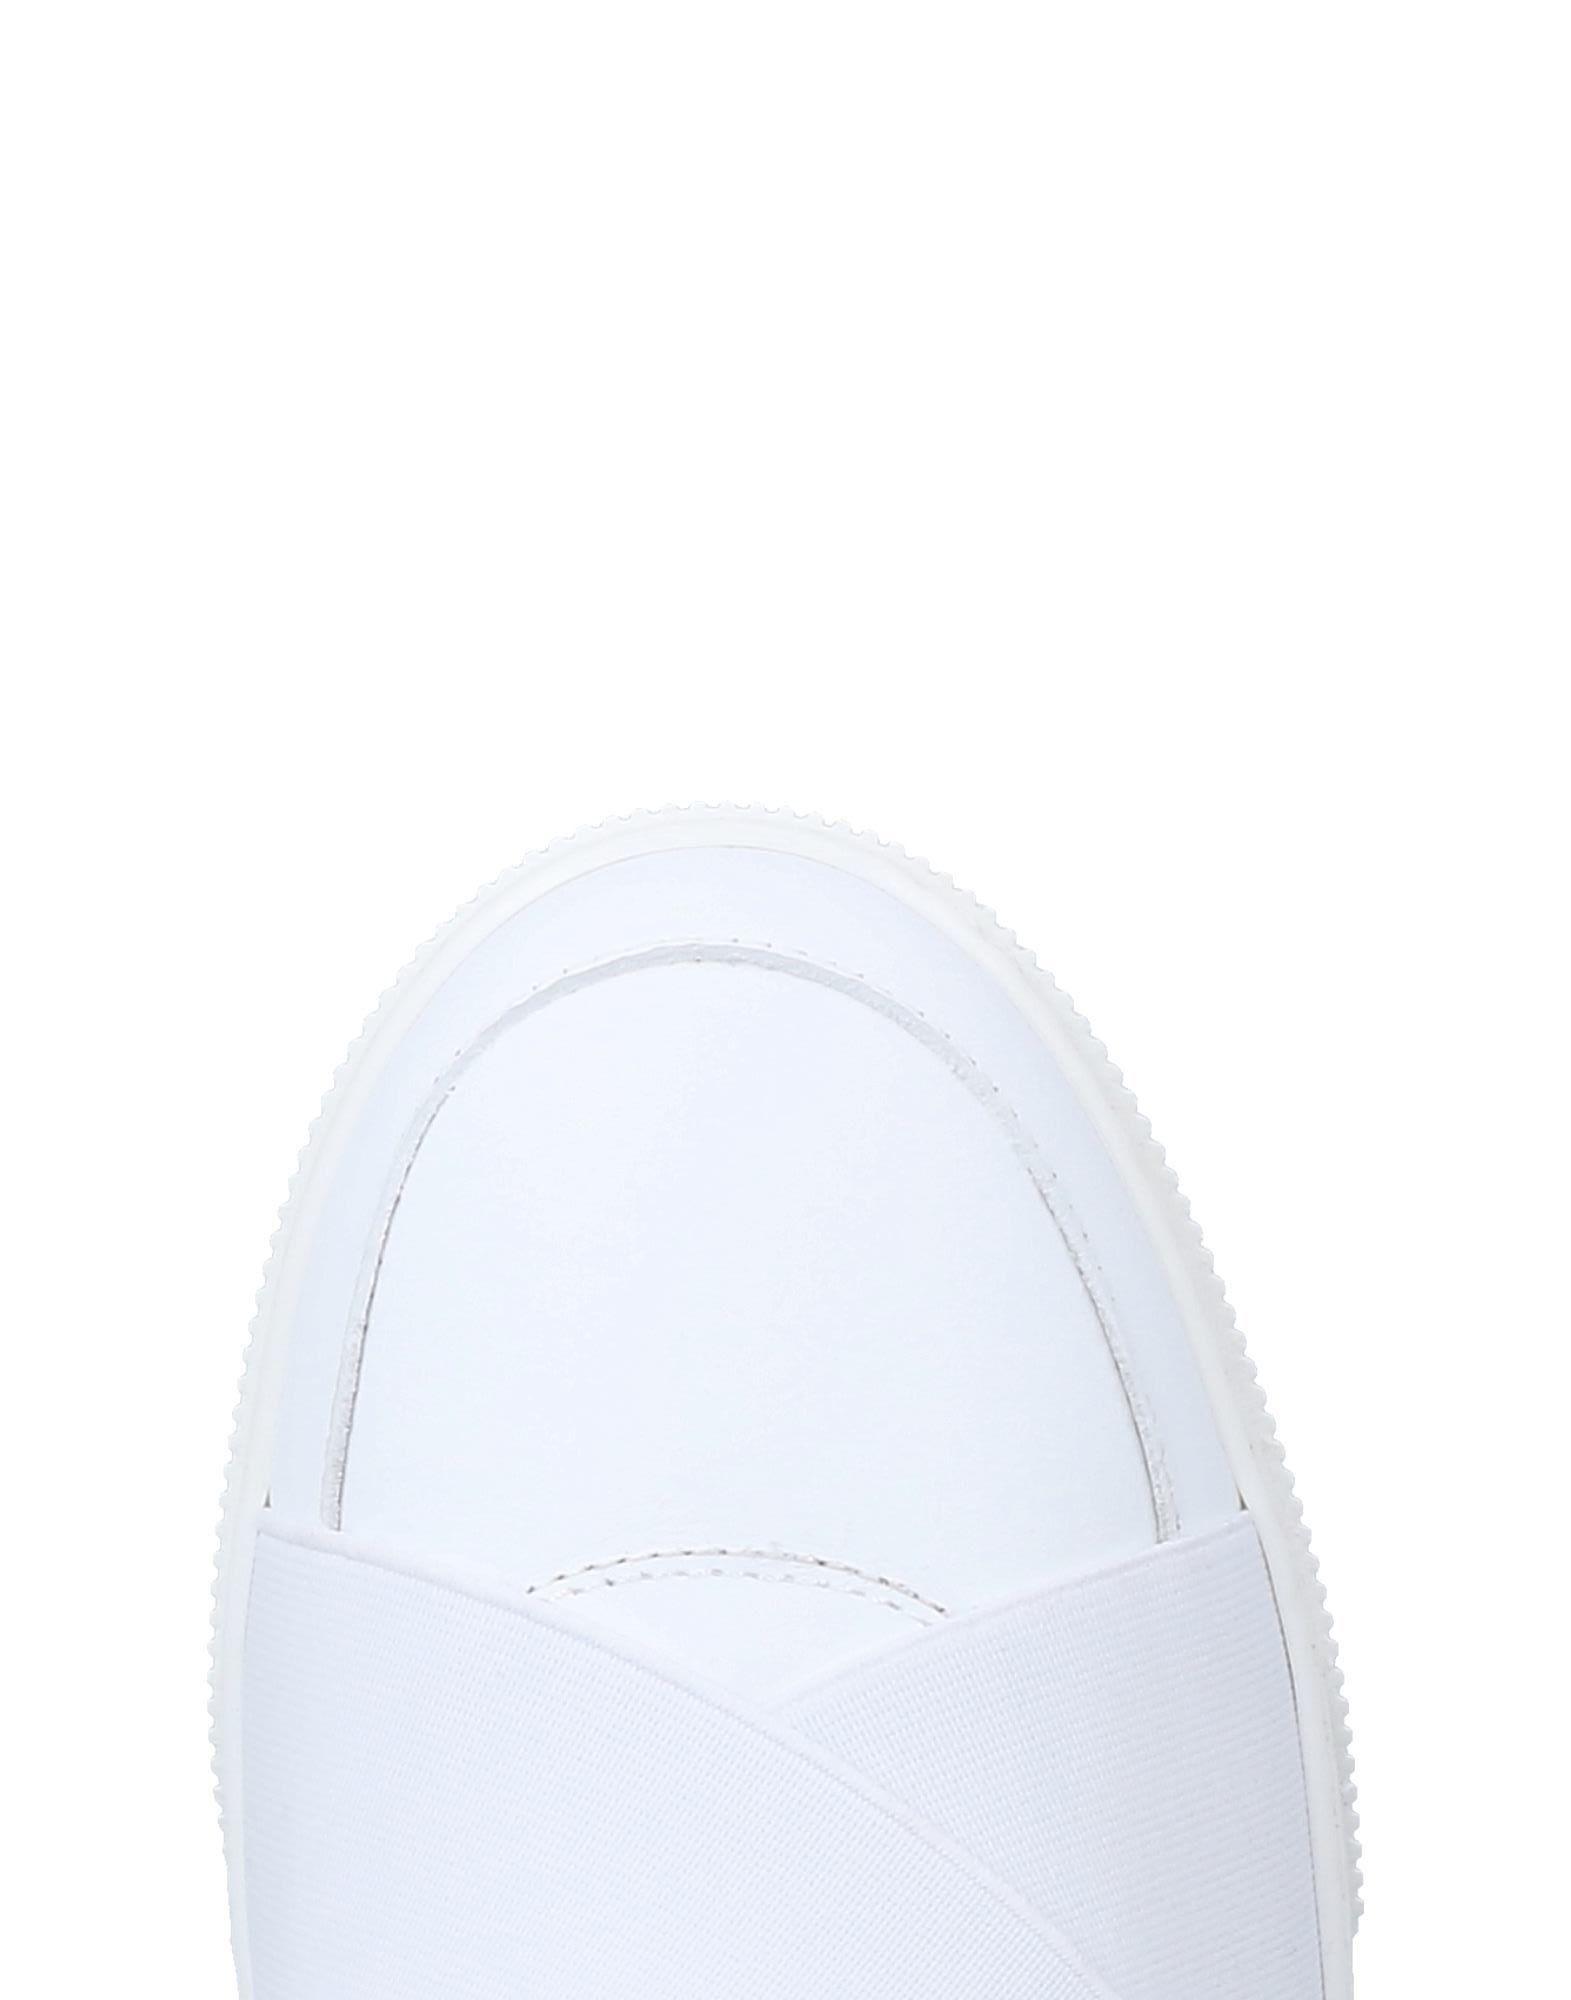 Proenza Proenza Proenza Schouler Sneakers Damen  11520770RBGut aussehende strapazierfähige Schuhe 8e2ace